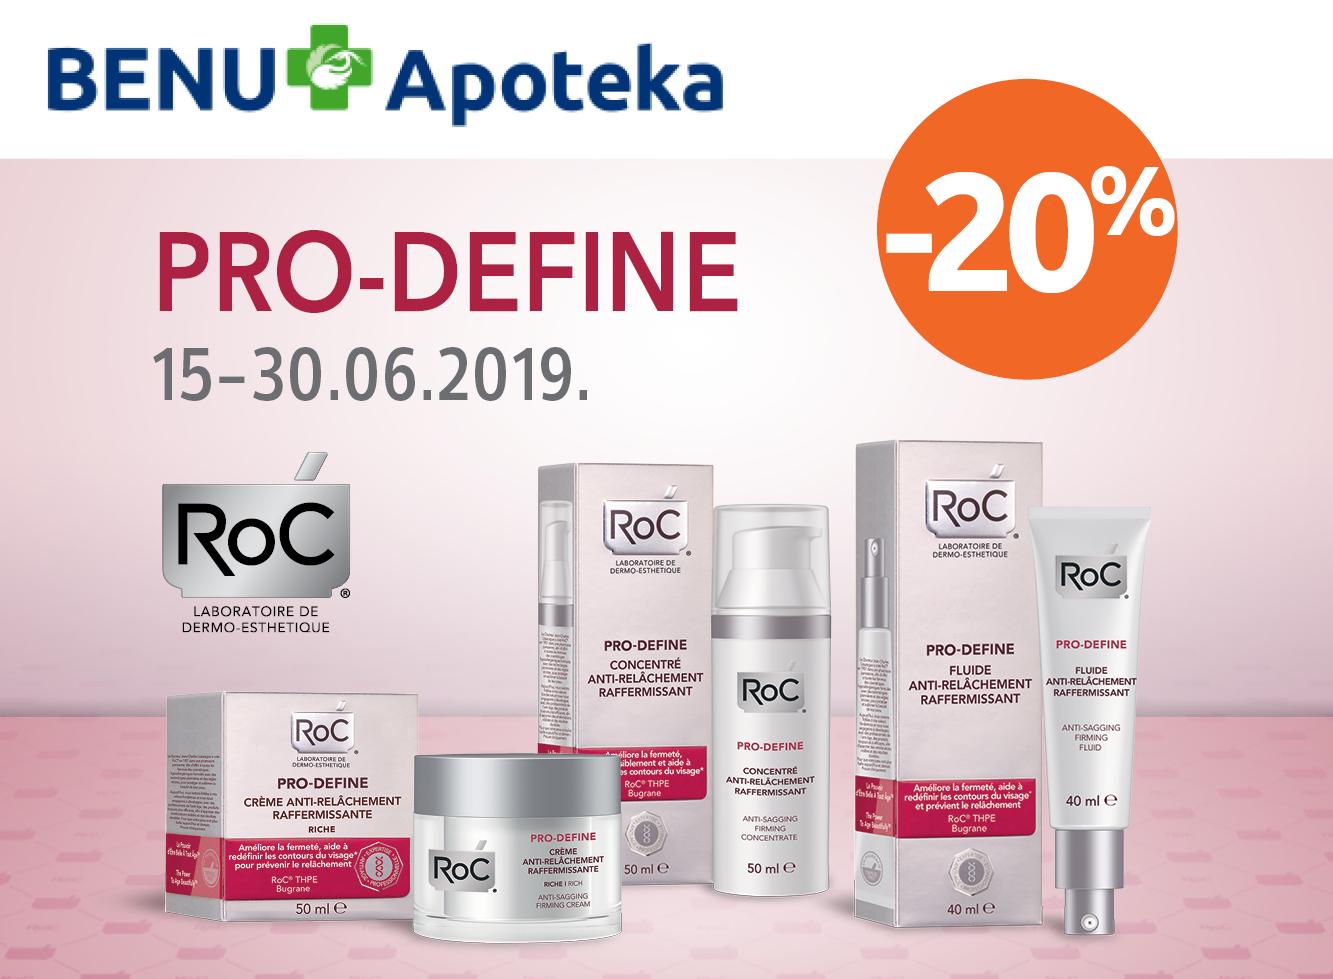 ROC PRO-DEFINE -20%